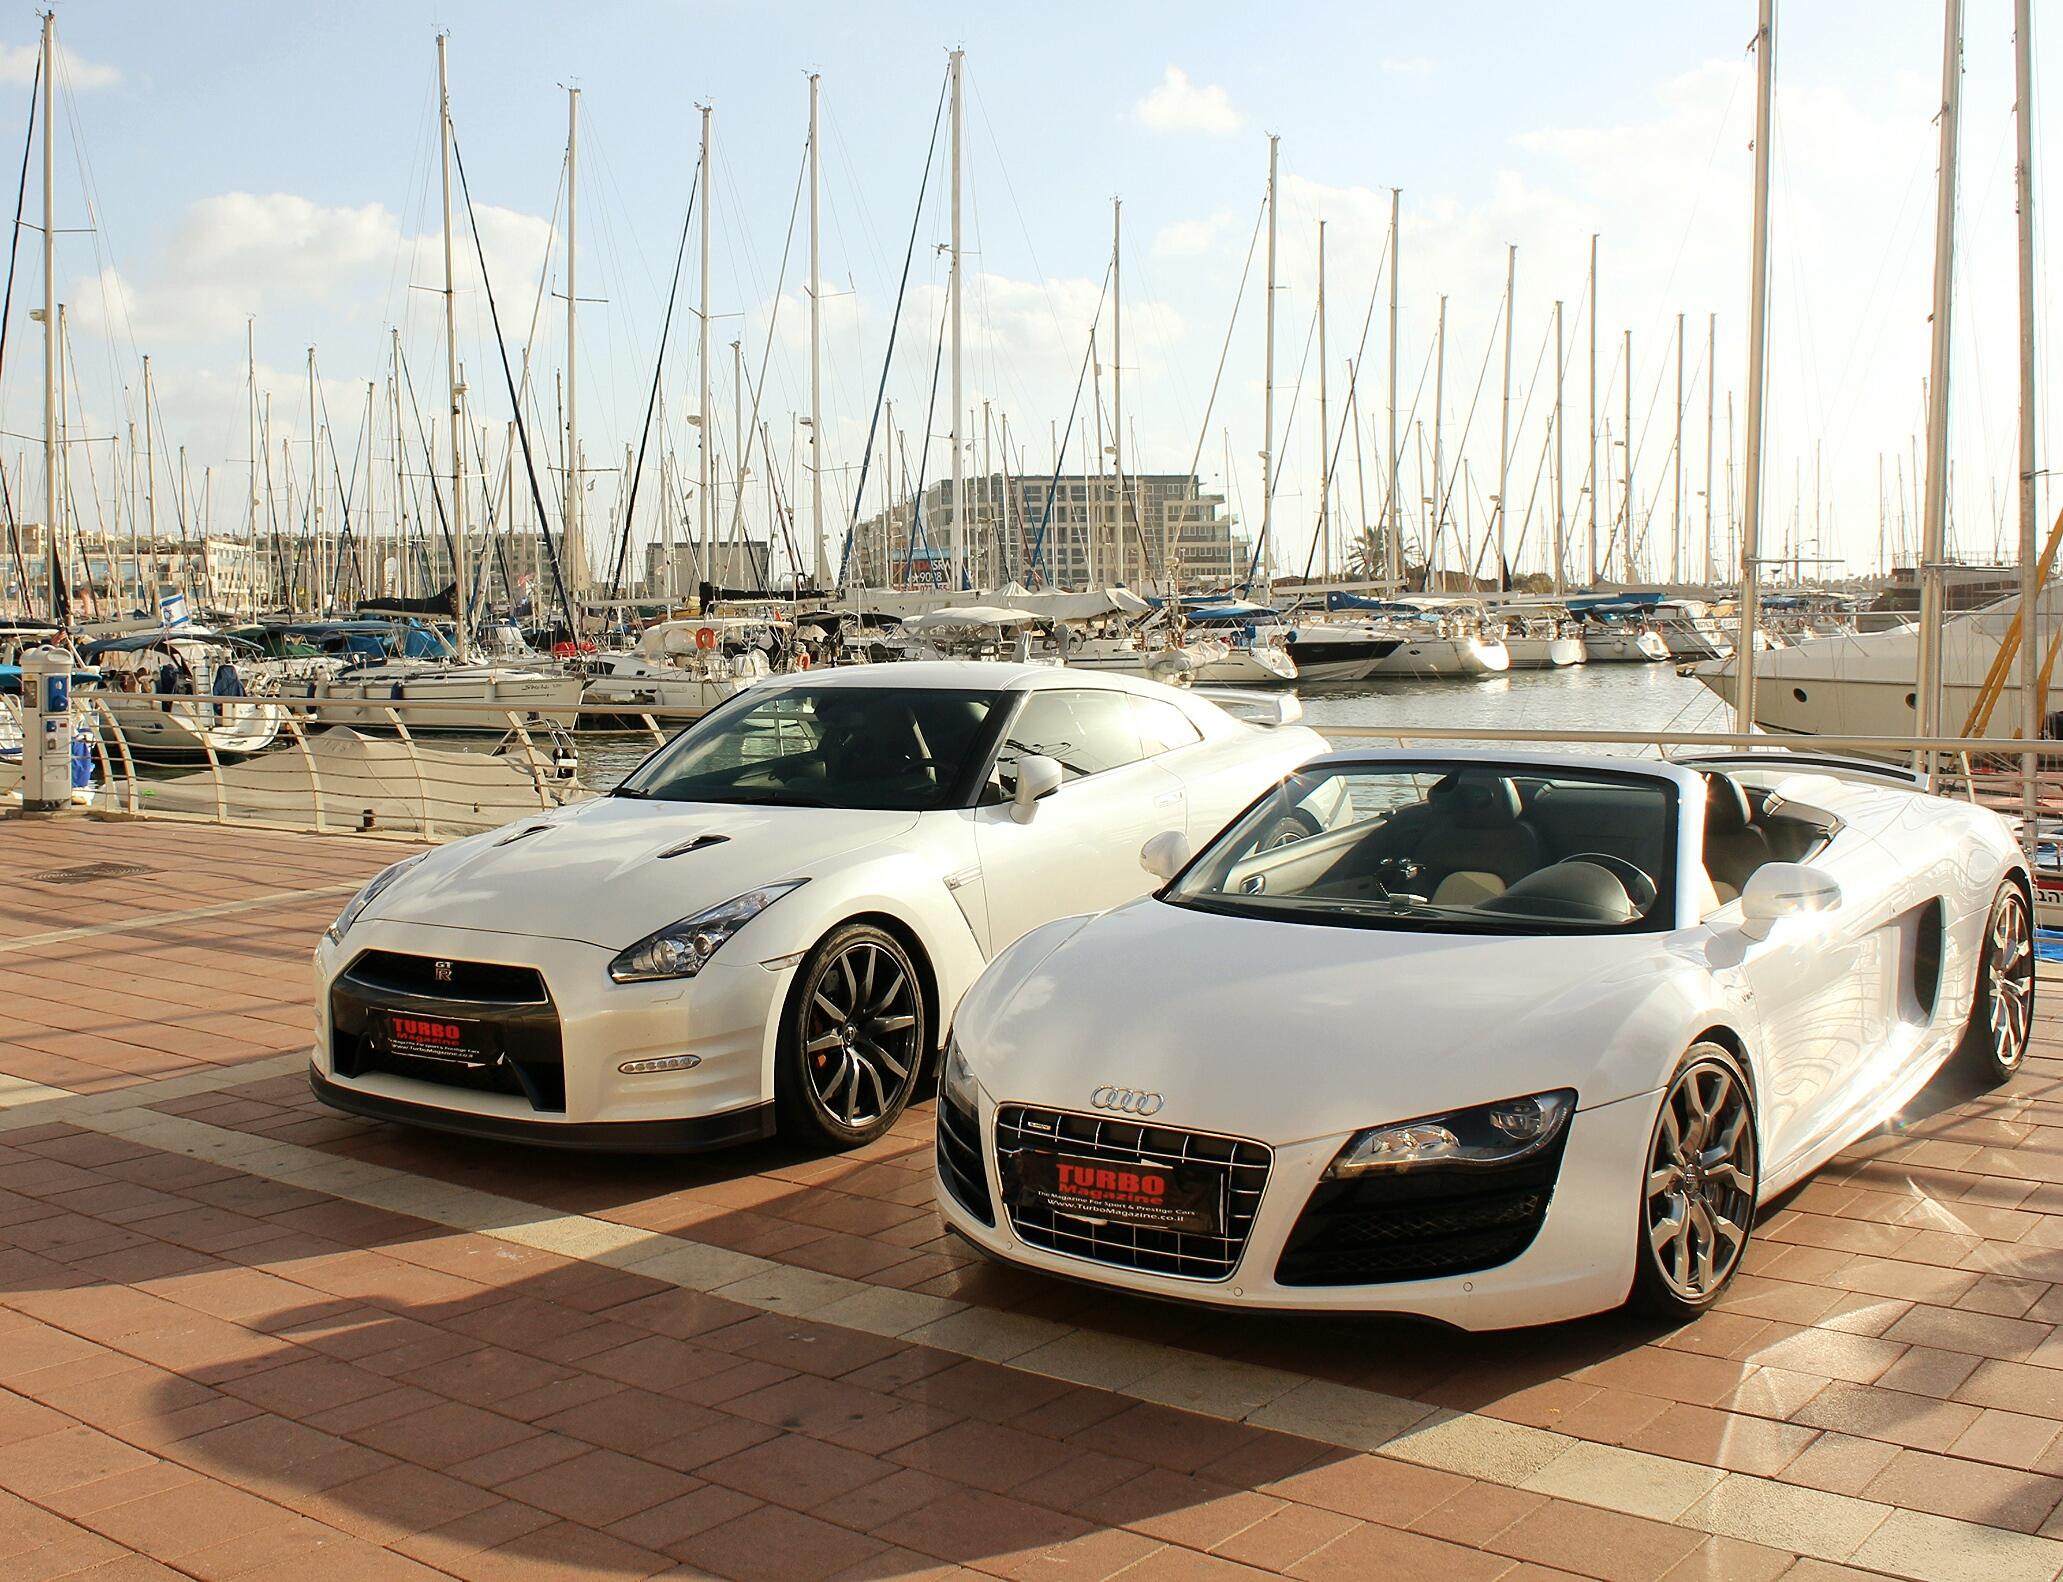 Audi R8 V10 Spyder And Nissan Gt R R35 By Daharid On